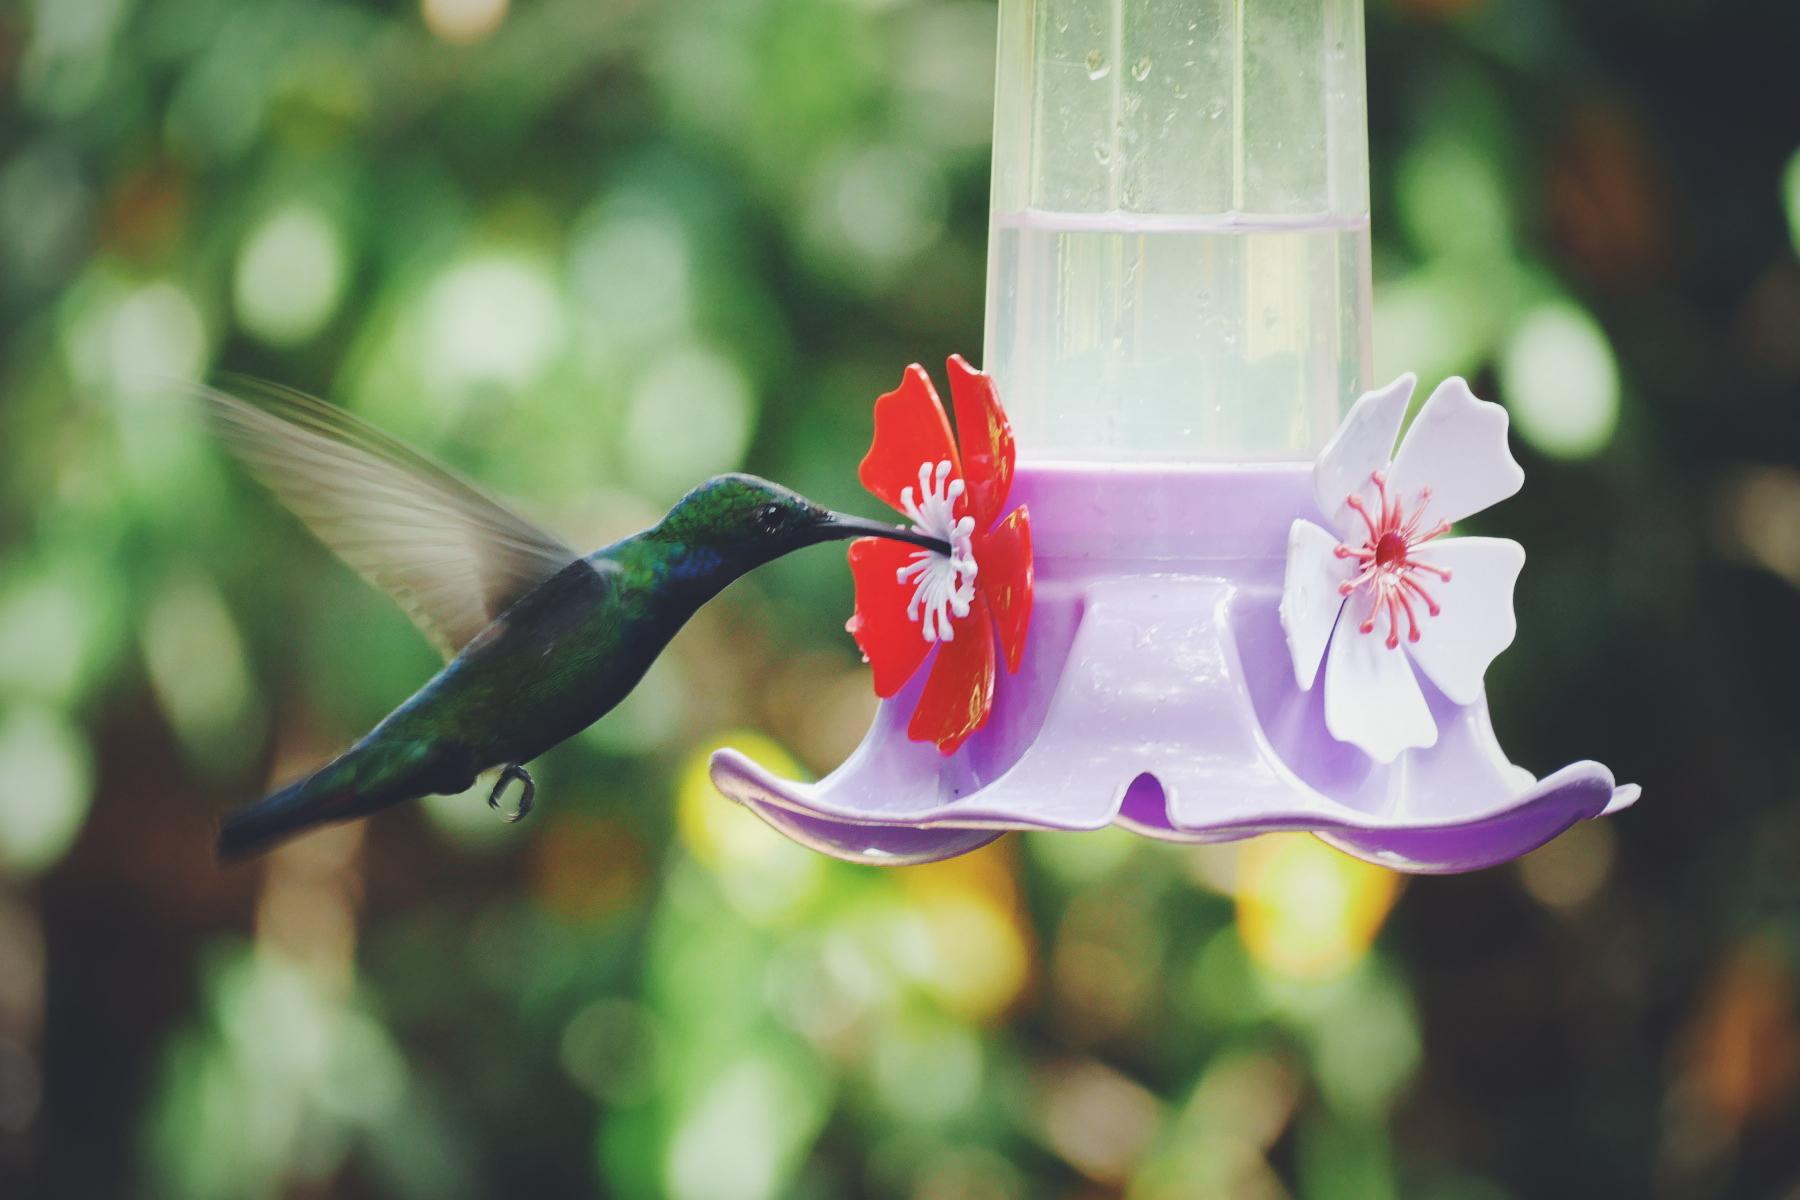 A Black-throated Mango at a hummingbird feeder in Puerto Iguazu. Noah Strycker